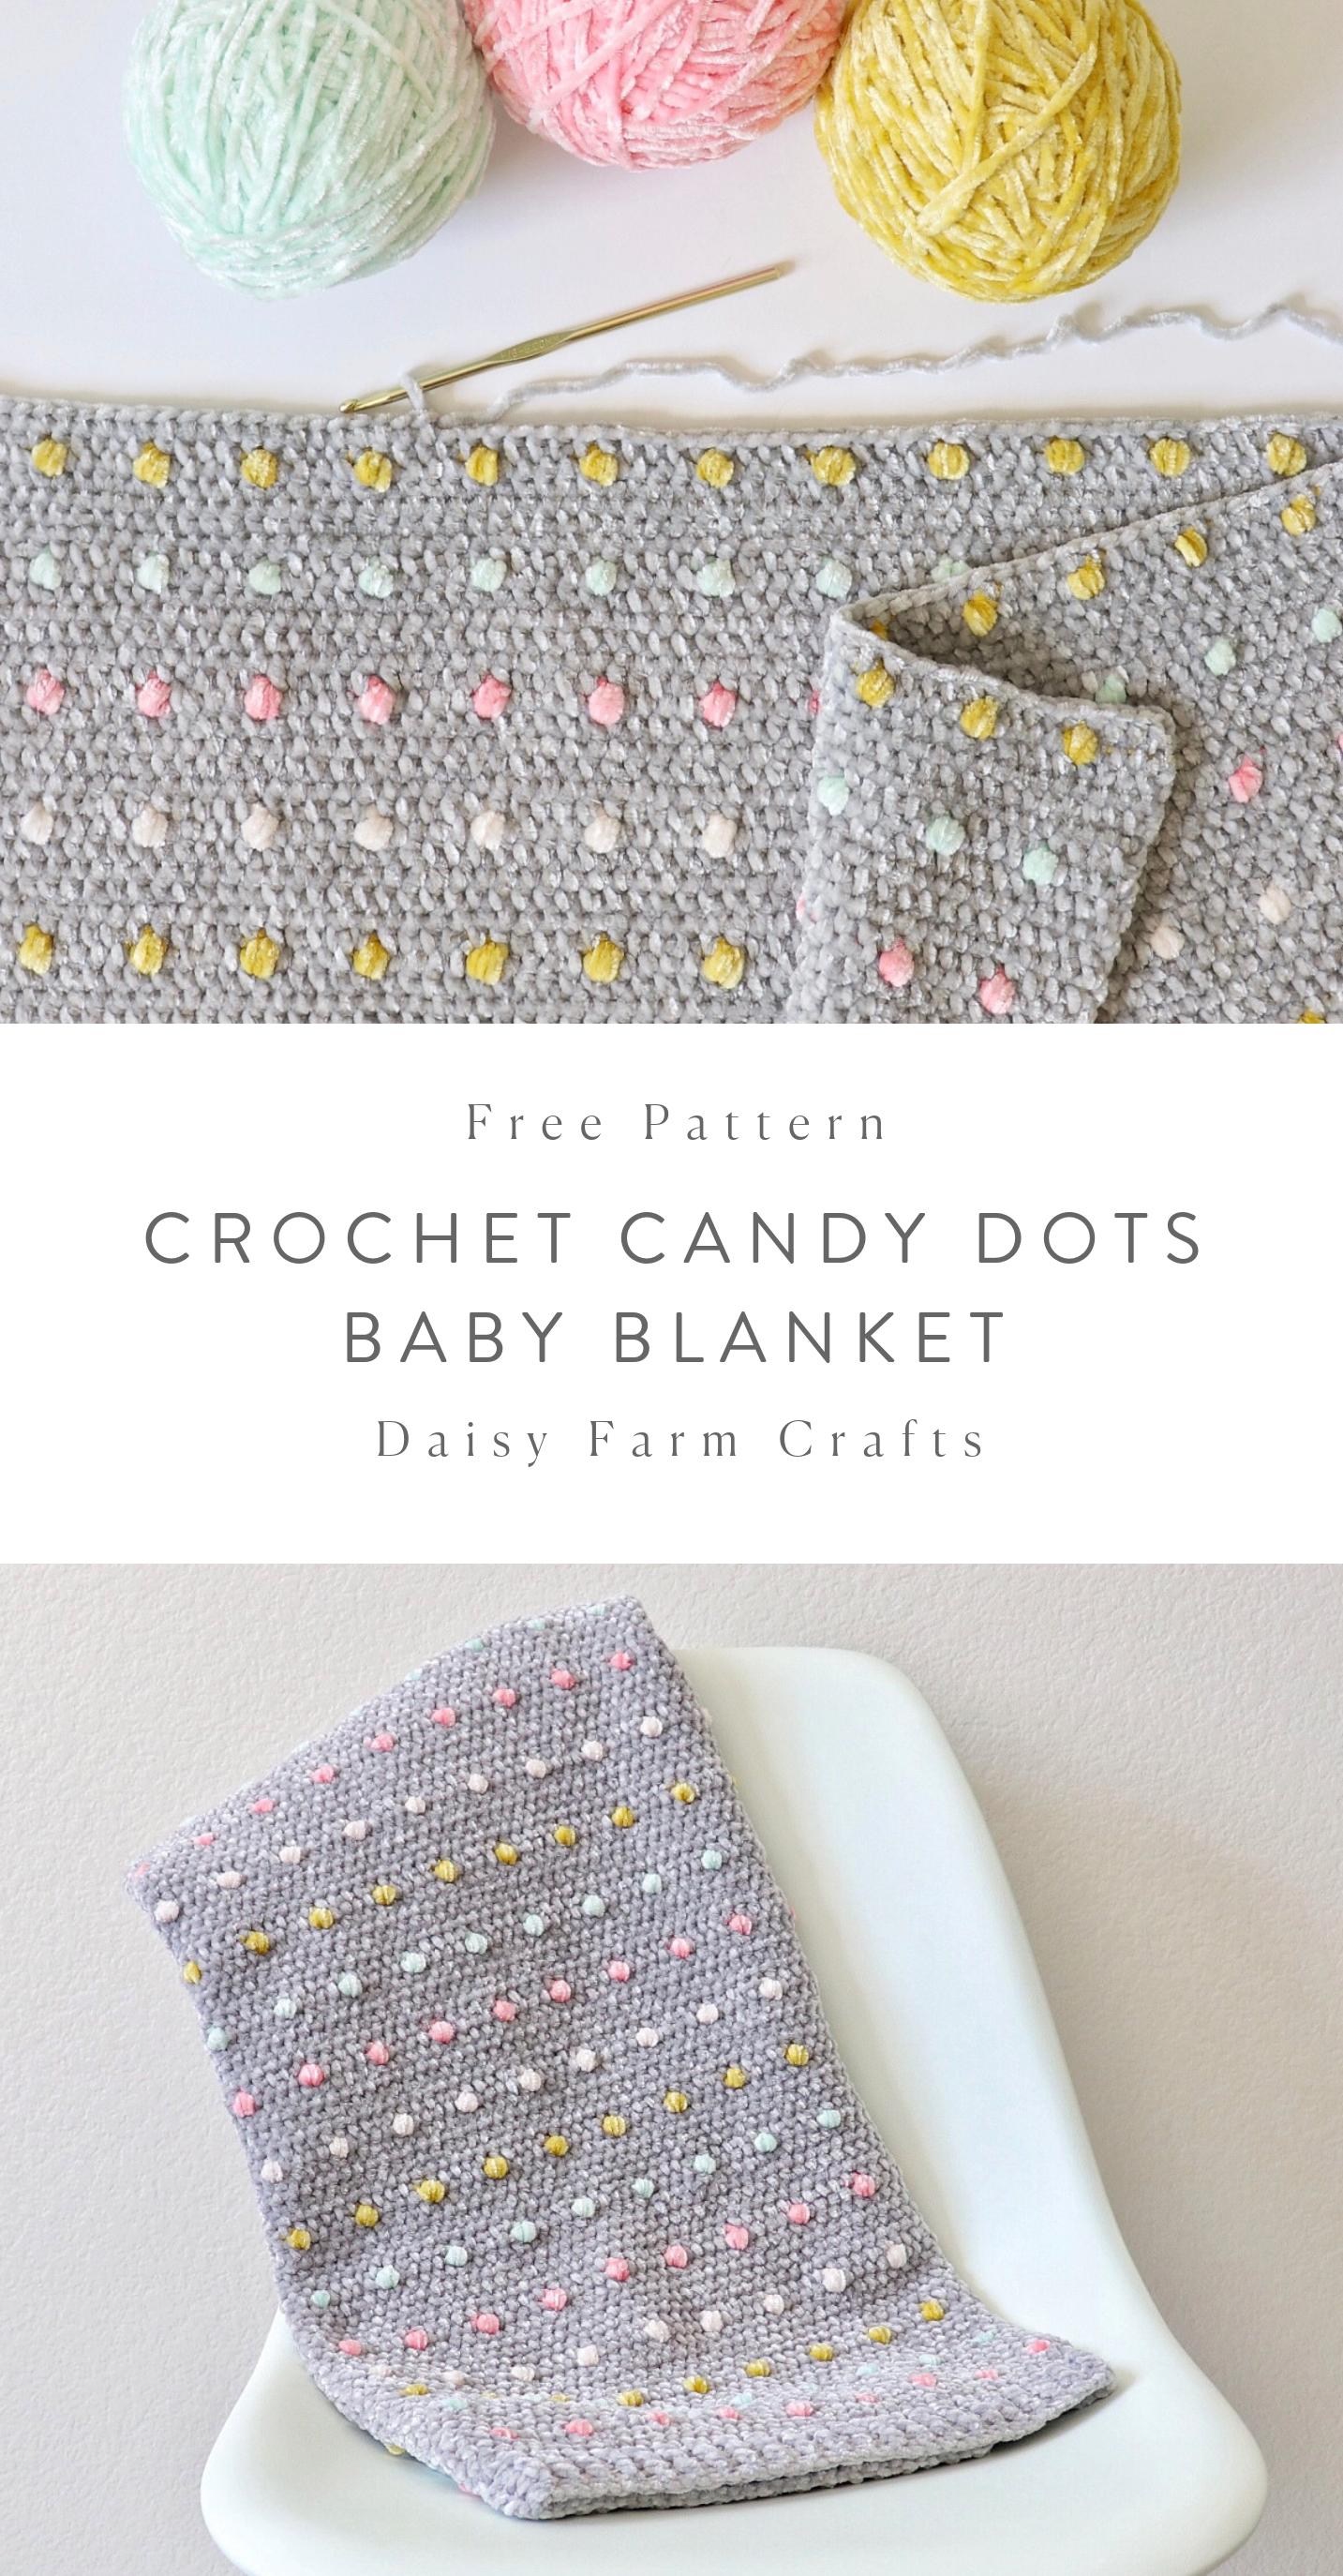 Free Crochet Blanket Pattern - Candy Dots Baby Blanket #babyblanket